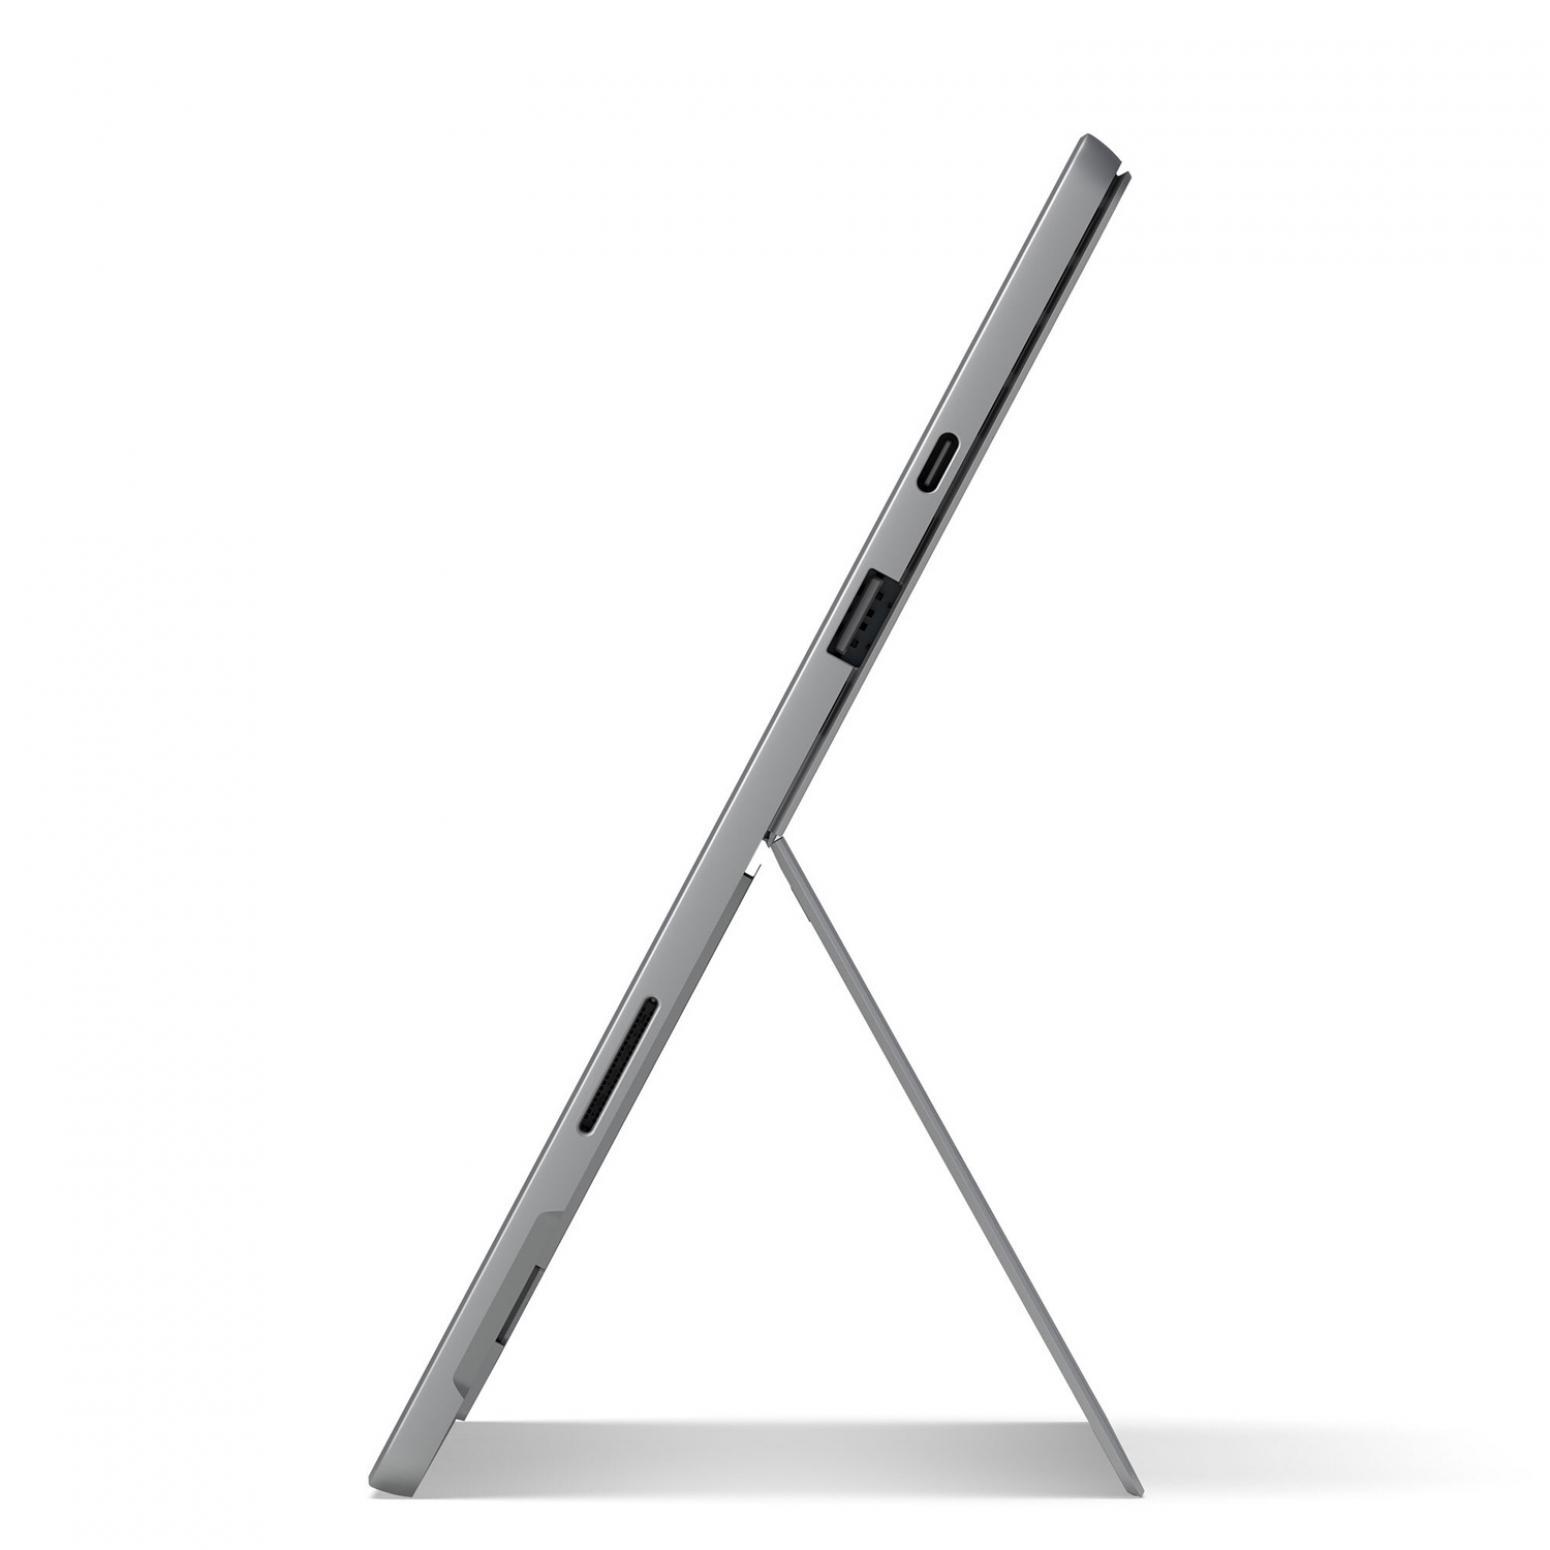 Ordinateur portable Microsoft Surface Pro 7 - Core i5, 8 Go, 256 Go - photo 7